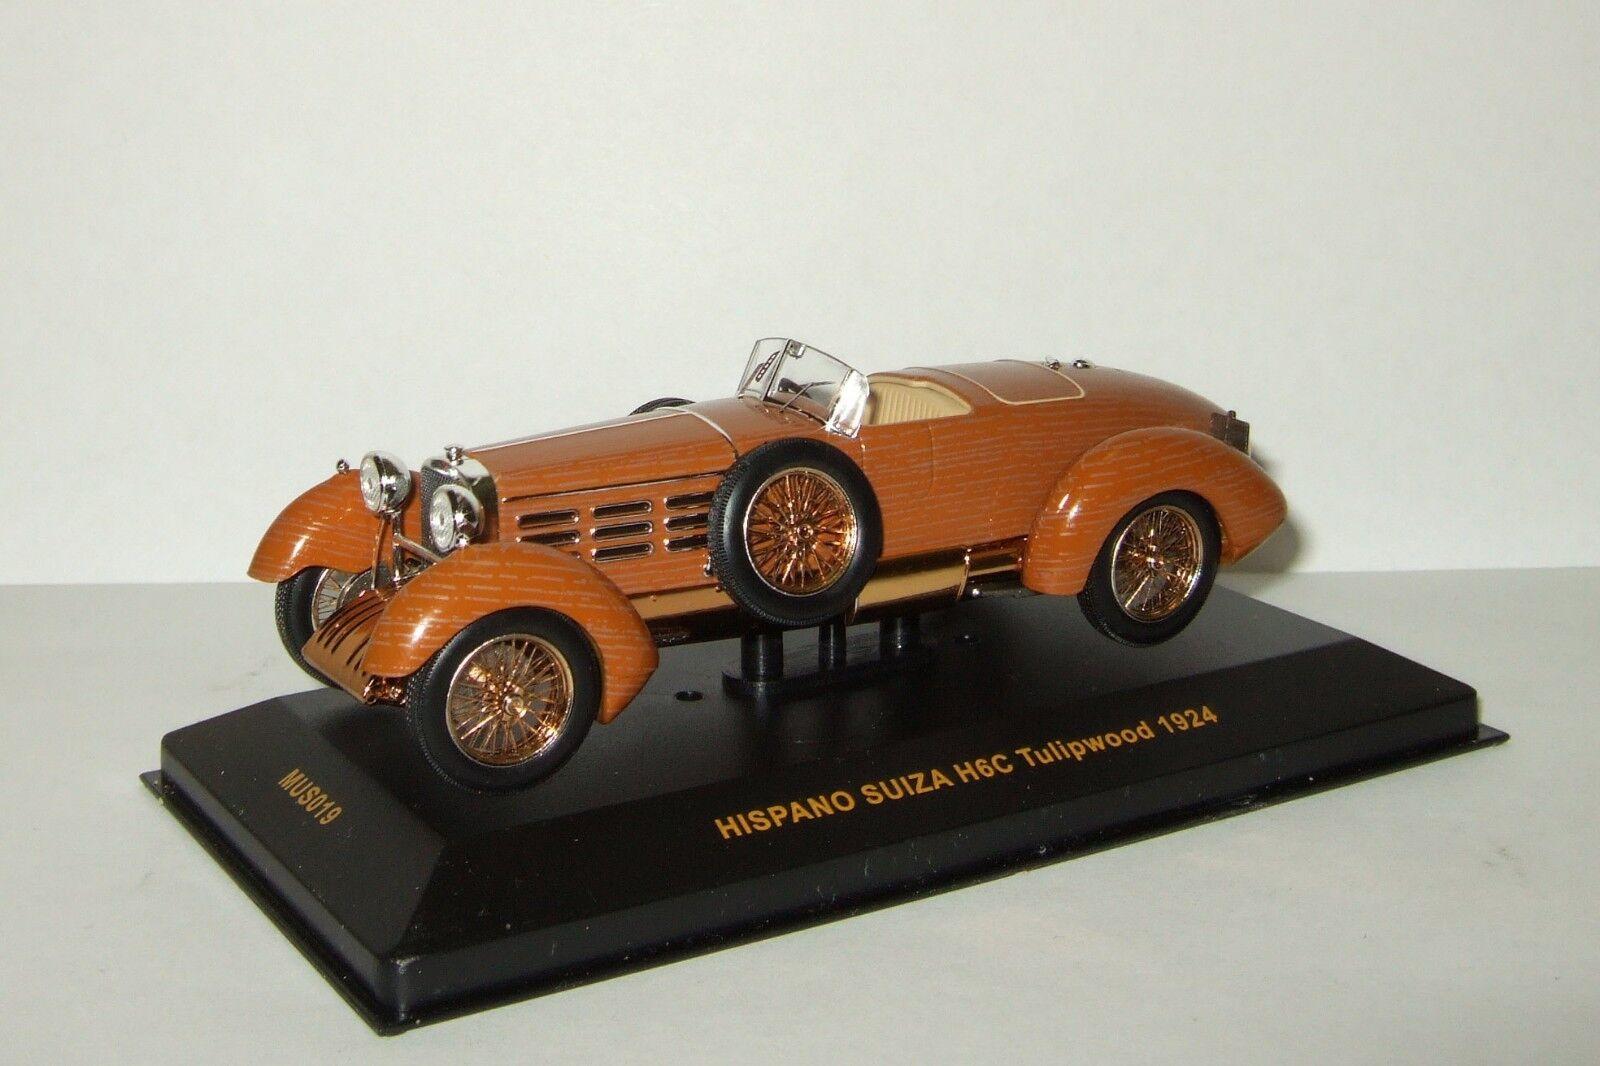 1 43 Ixo Museum HISPANO SUIZA H6C Tulipwood 1924 Mus 019